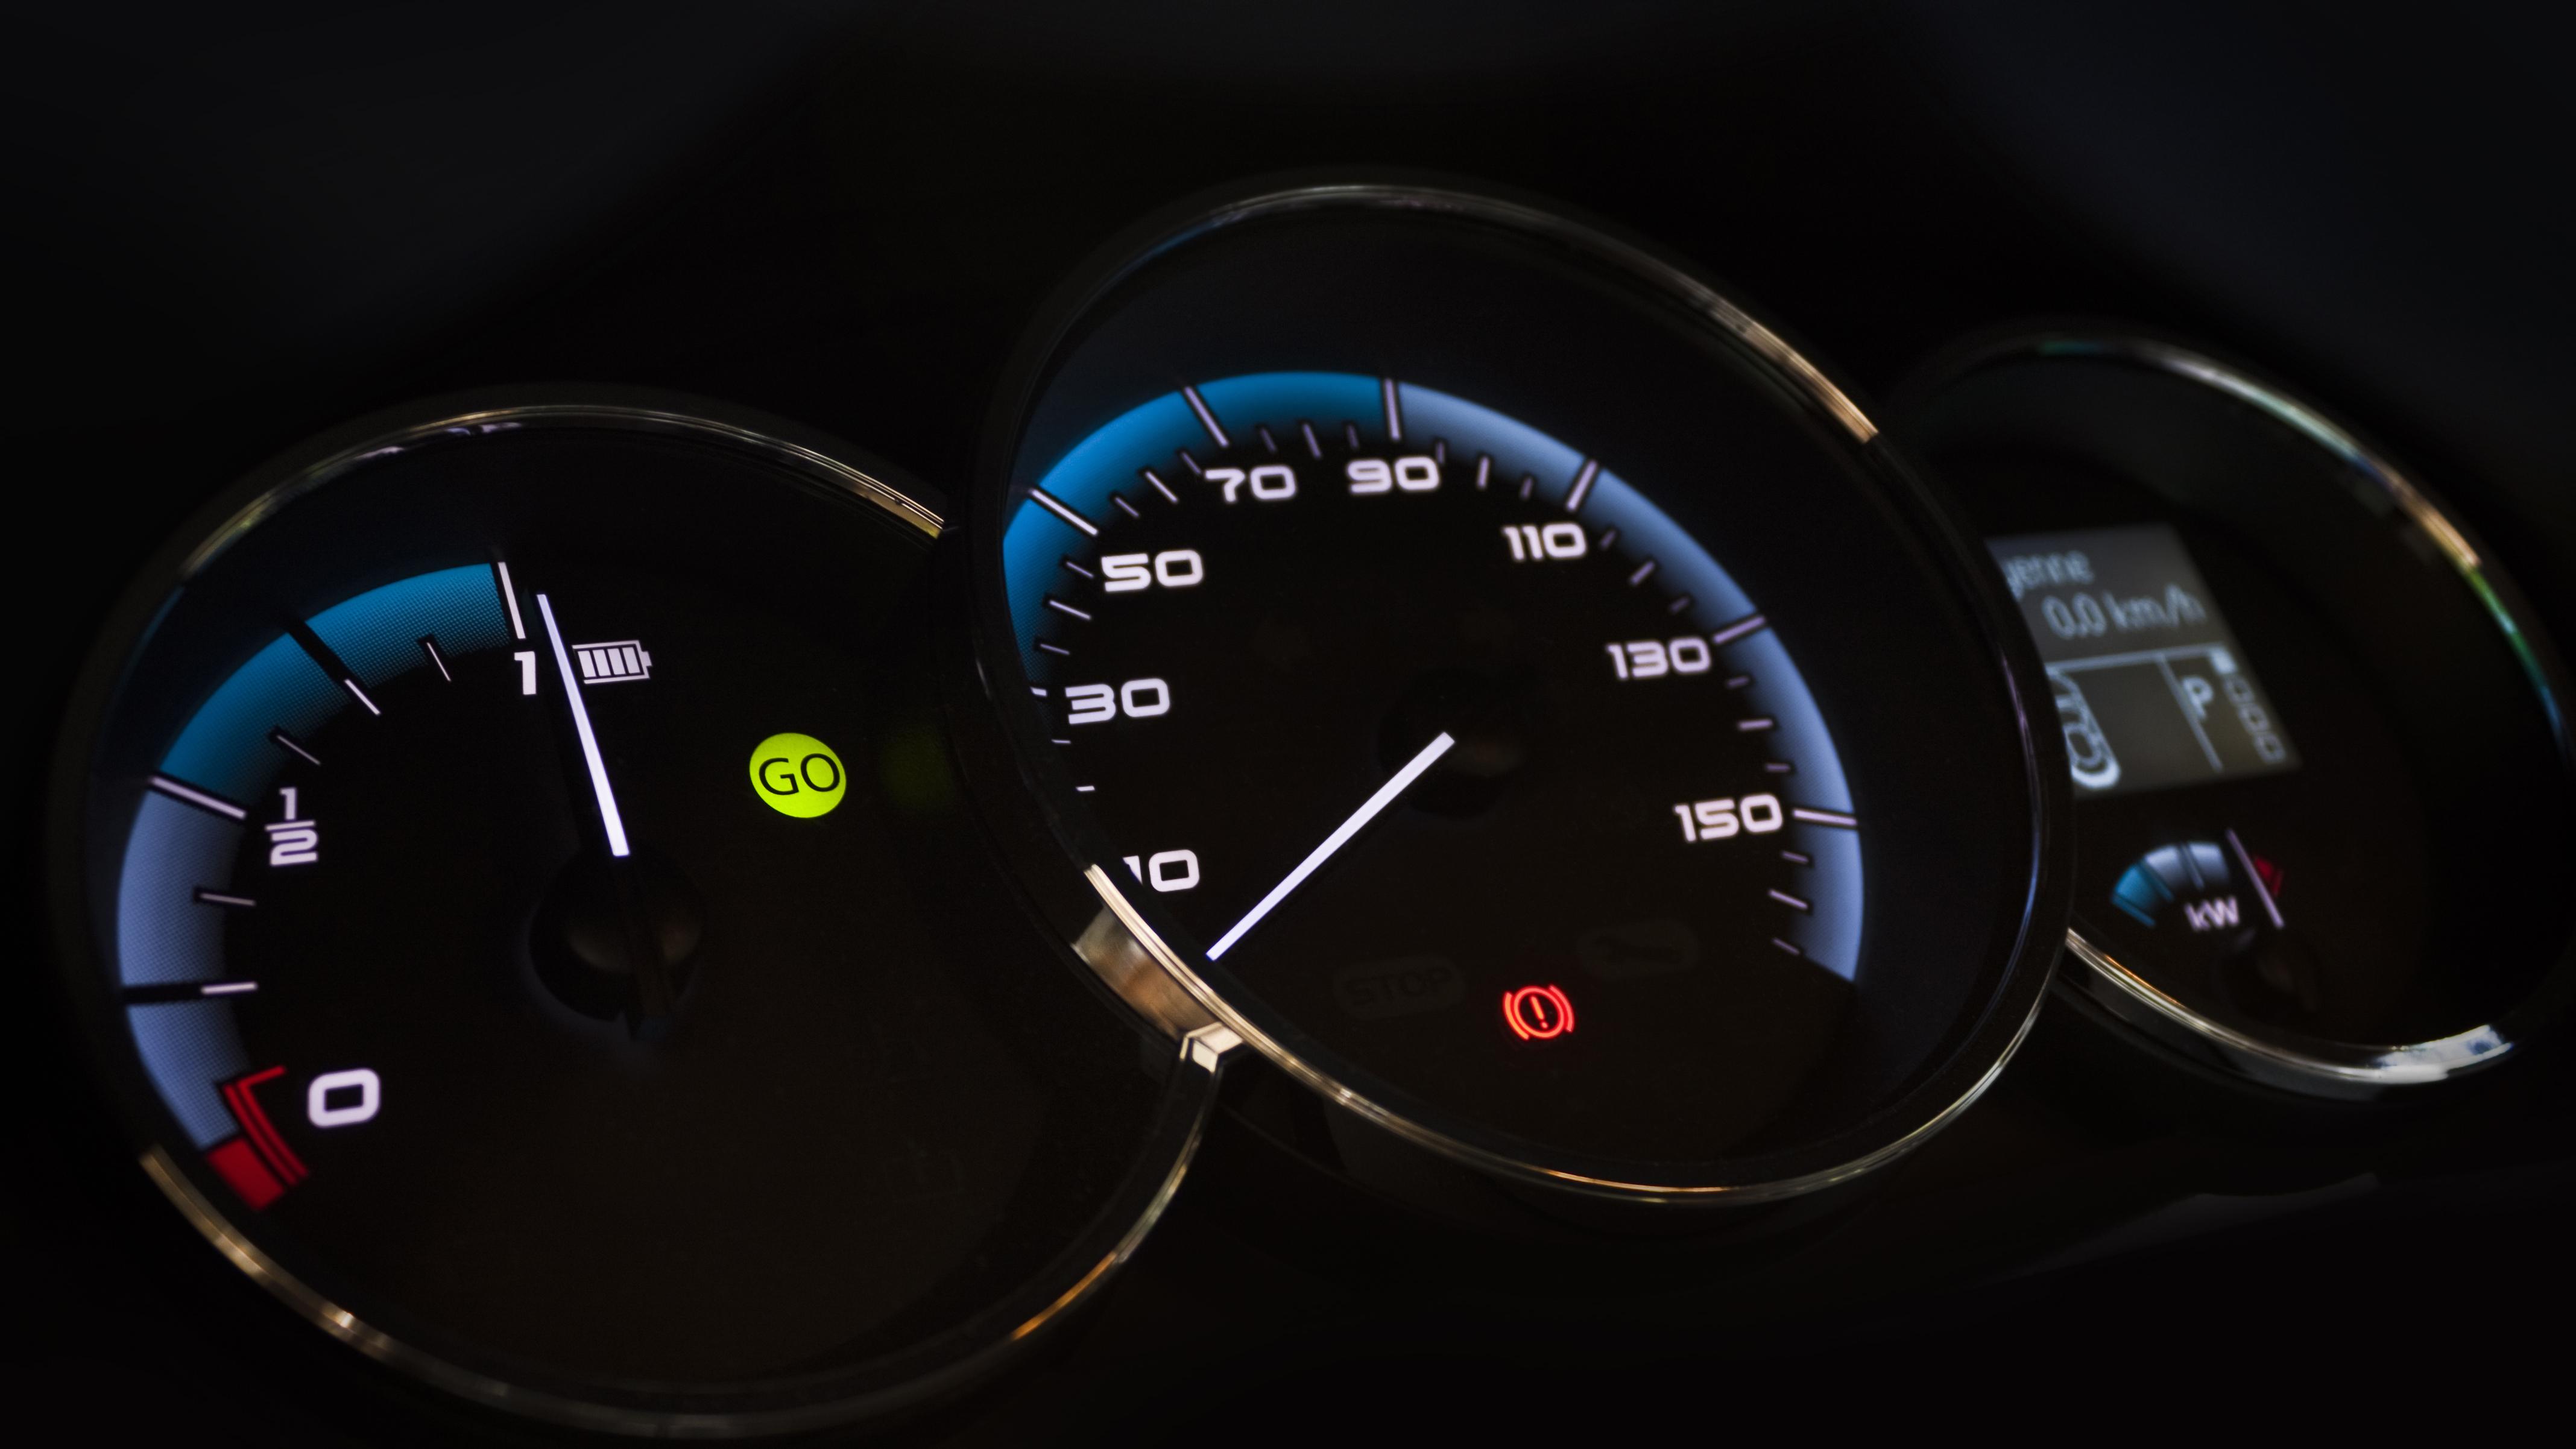 Car Dashboard Diagram | Electric Car Warning Lights Dashboard Symbols Explained Buyacar